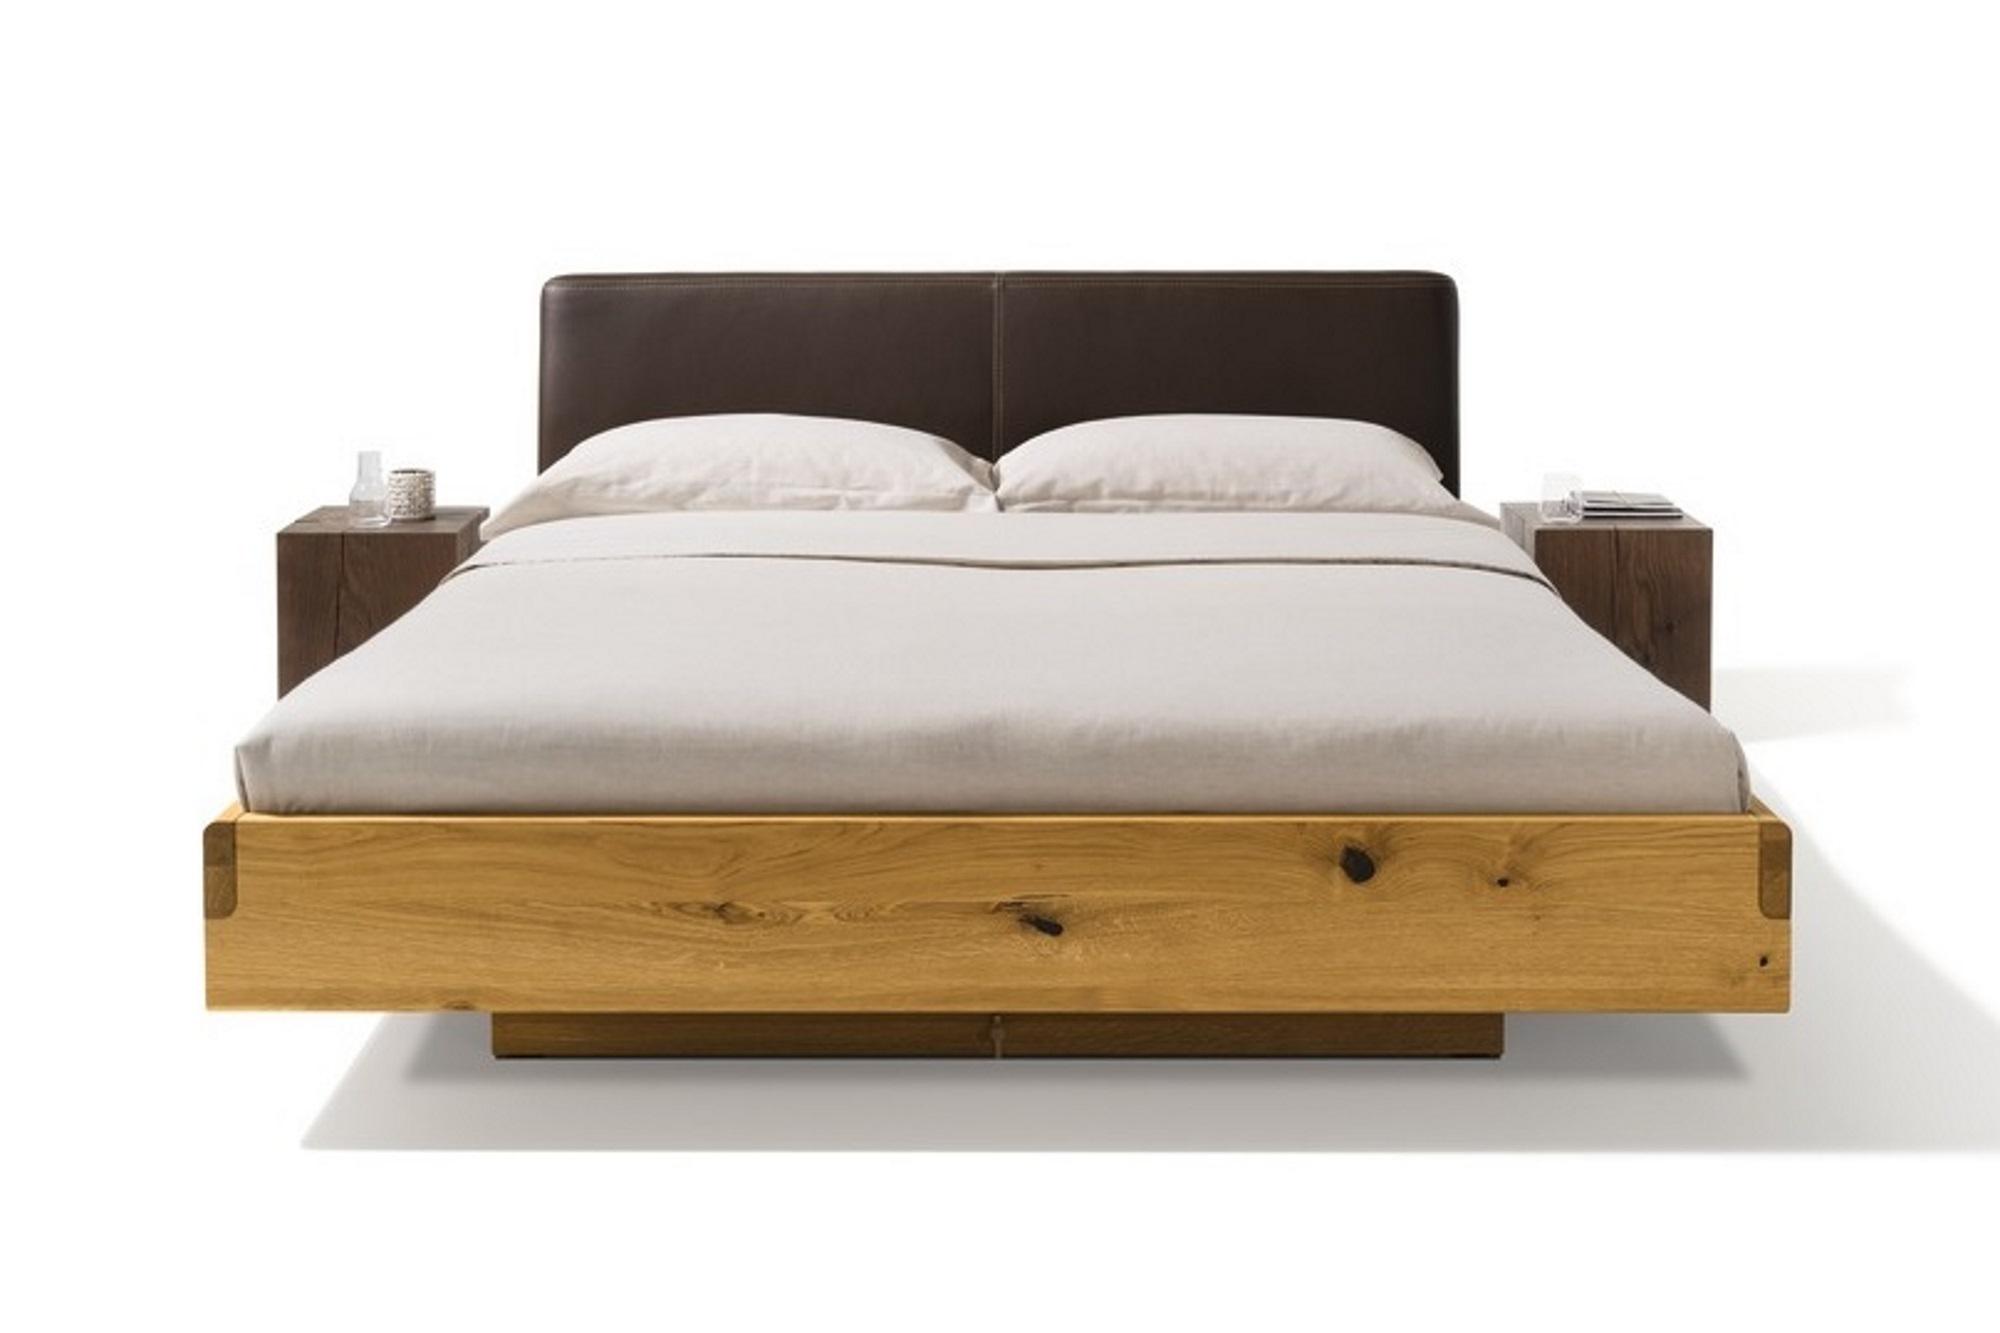 bett nox biom bel bonn. Black Bedroom Furniture Sets. Home Design Ideas